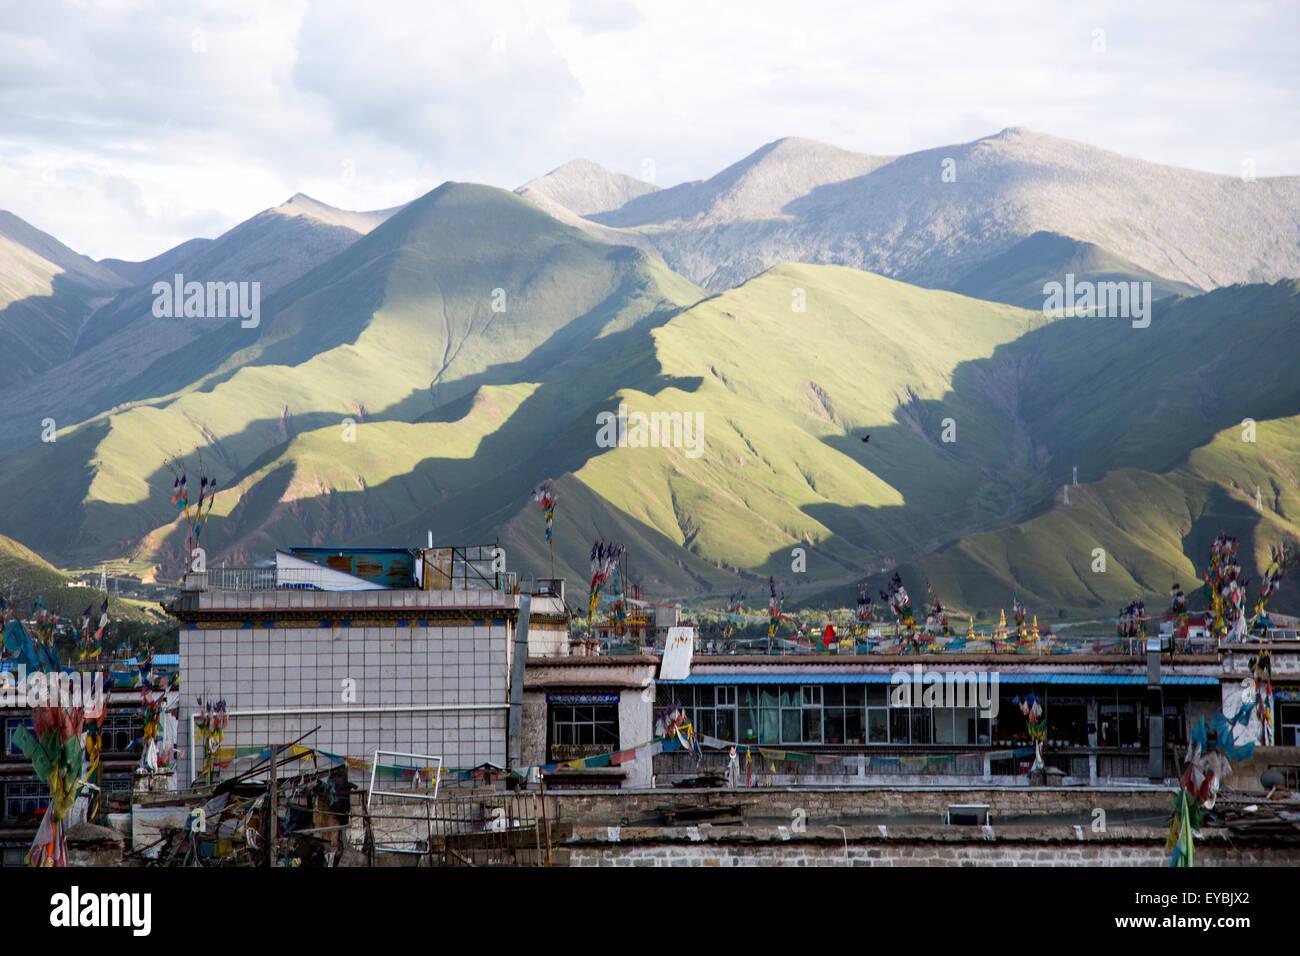 Mountains in Lhasa, Chinese Tibet - Stock Image